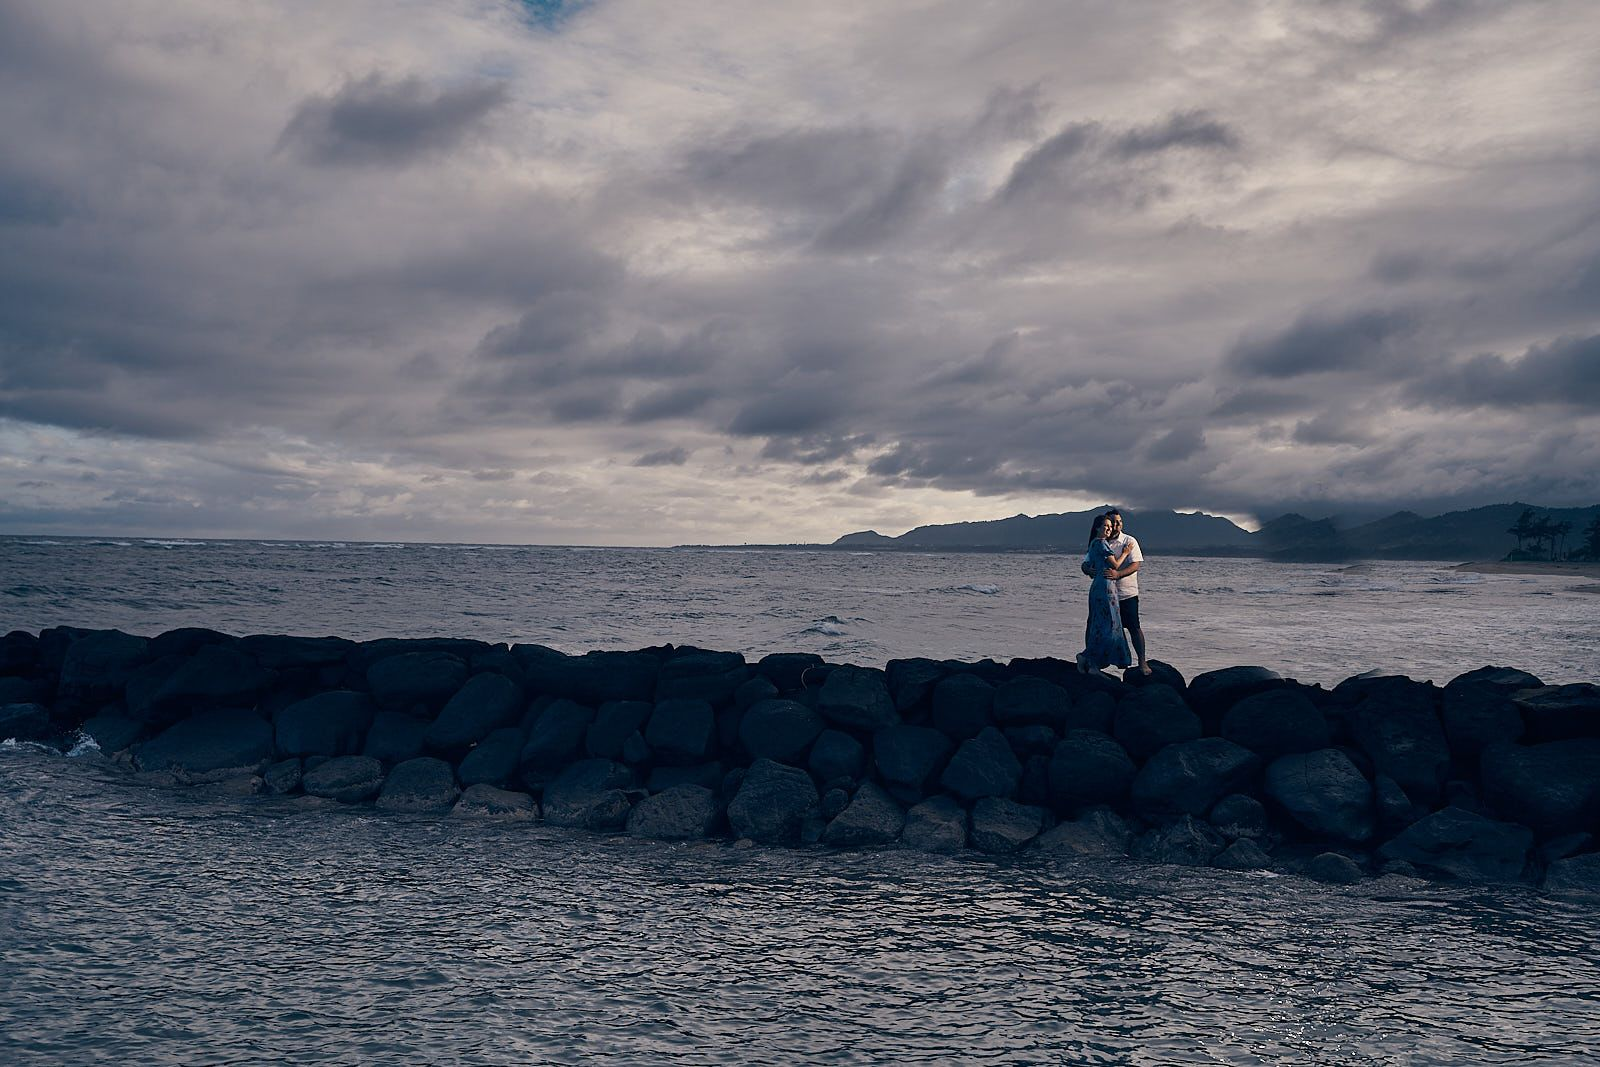 engagement-photo-shoot-east-kauai-beach-location-afewgoodclicks 61